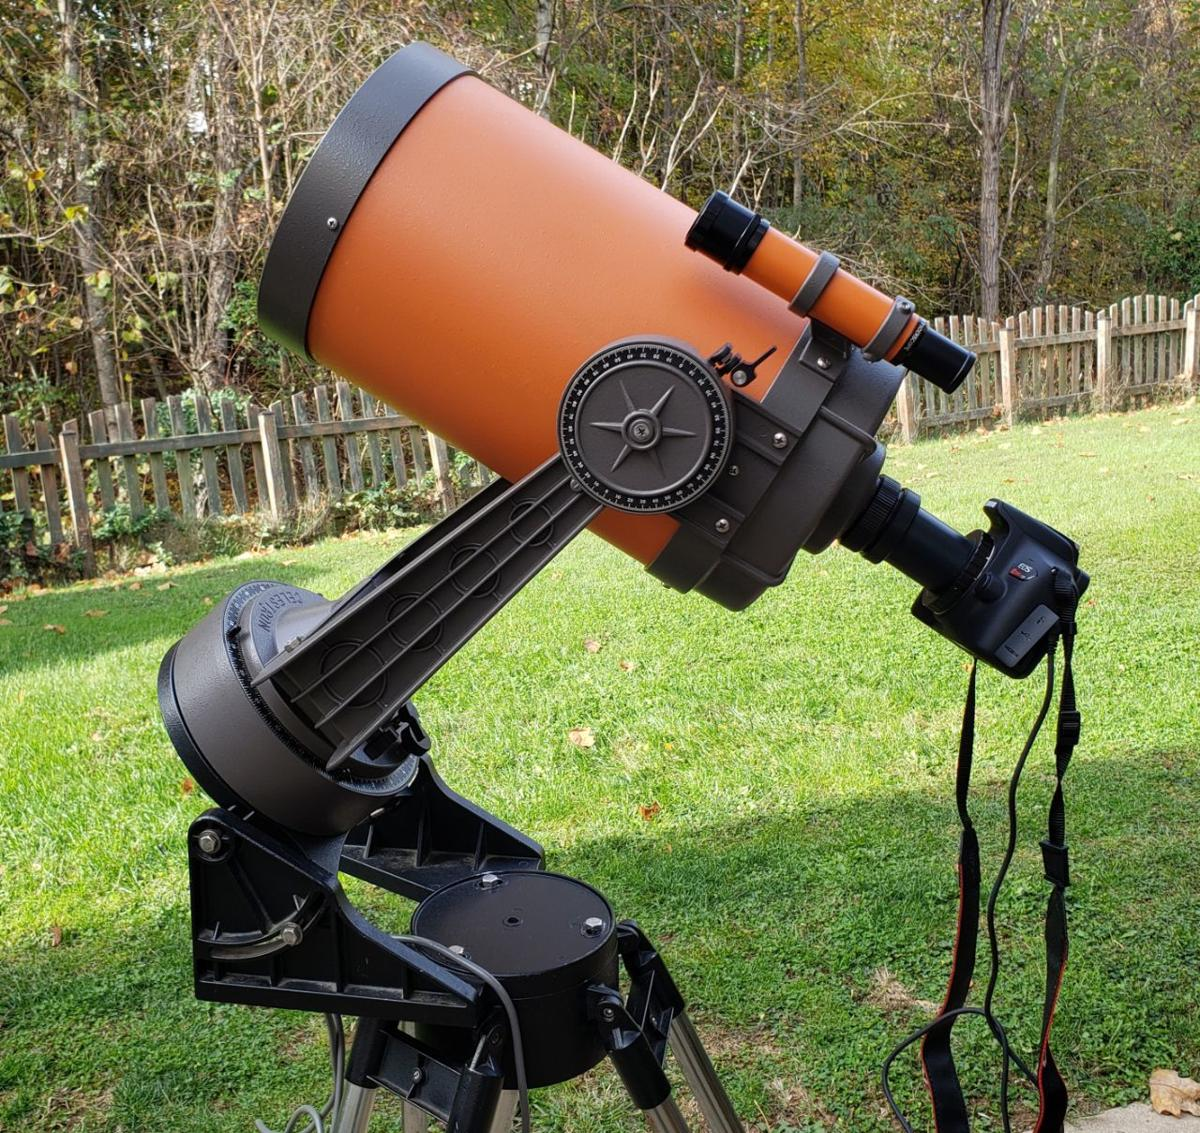 Stargazing: Telescopes for the Holidays